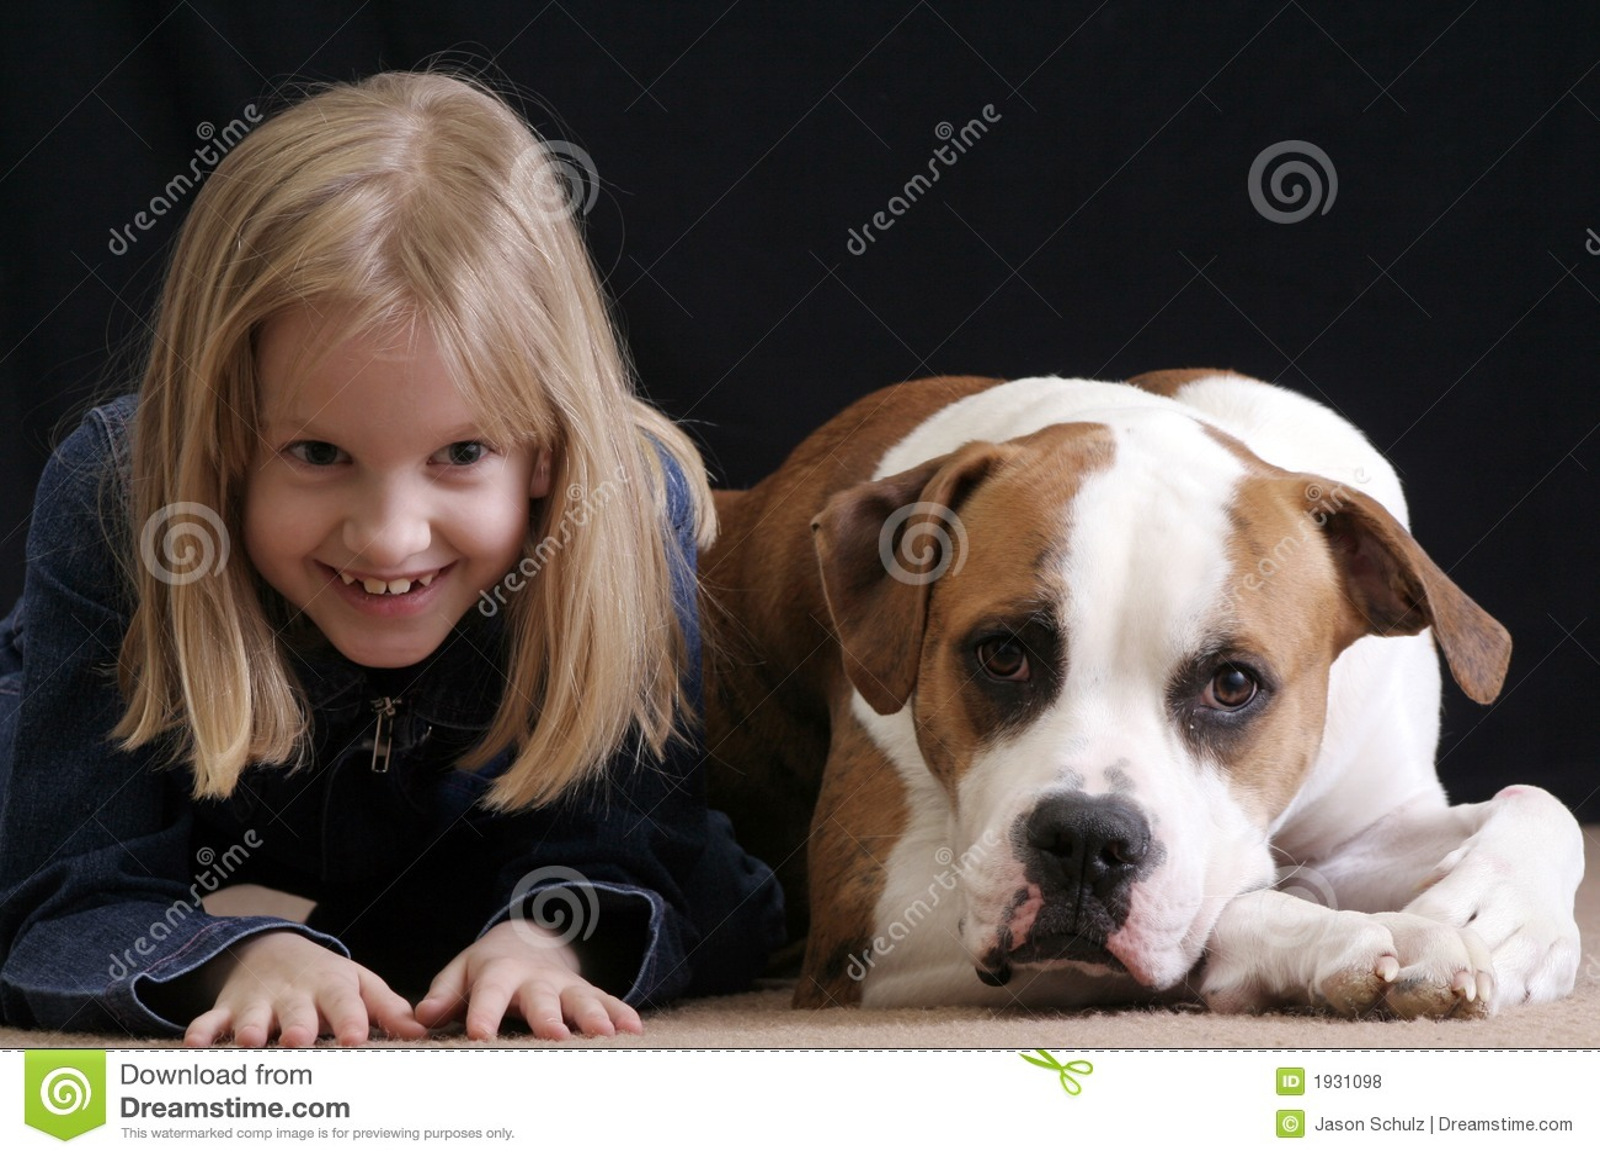 Girl mimics dog